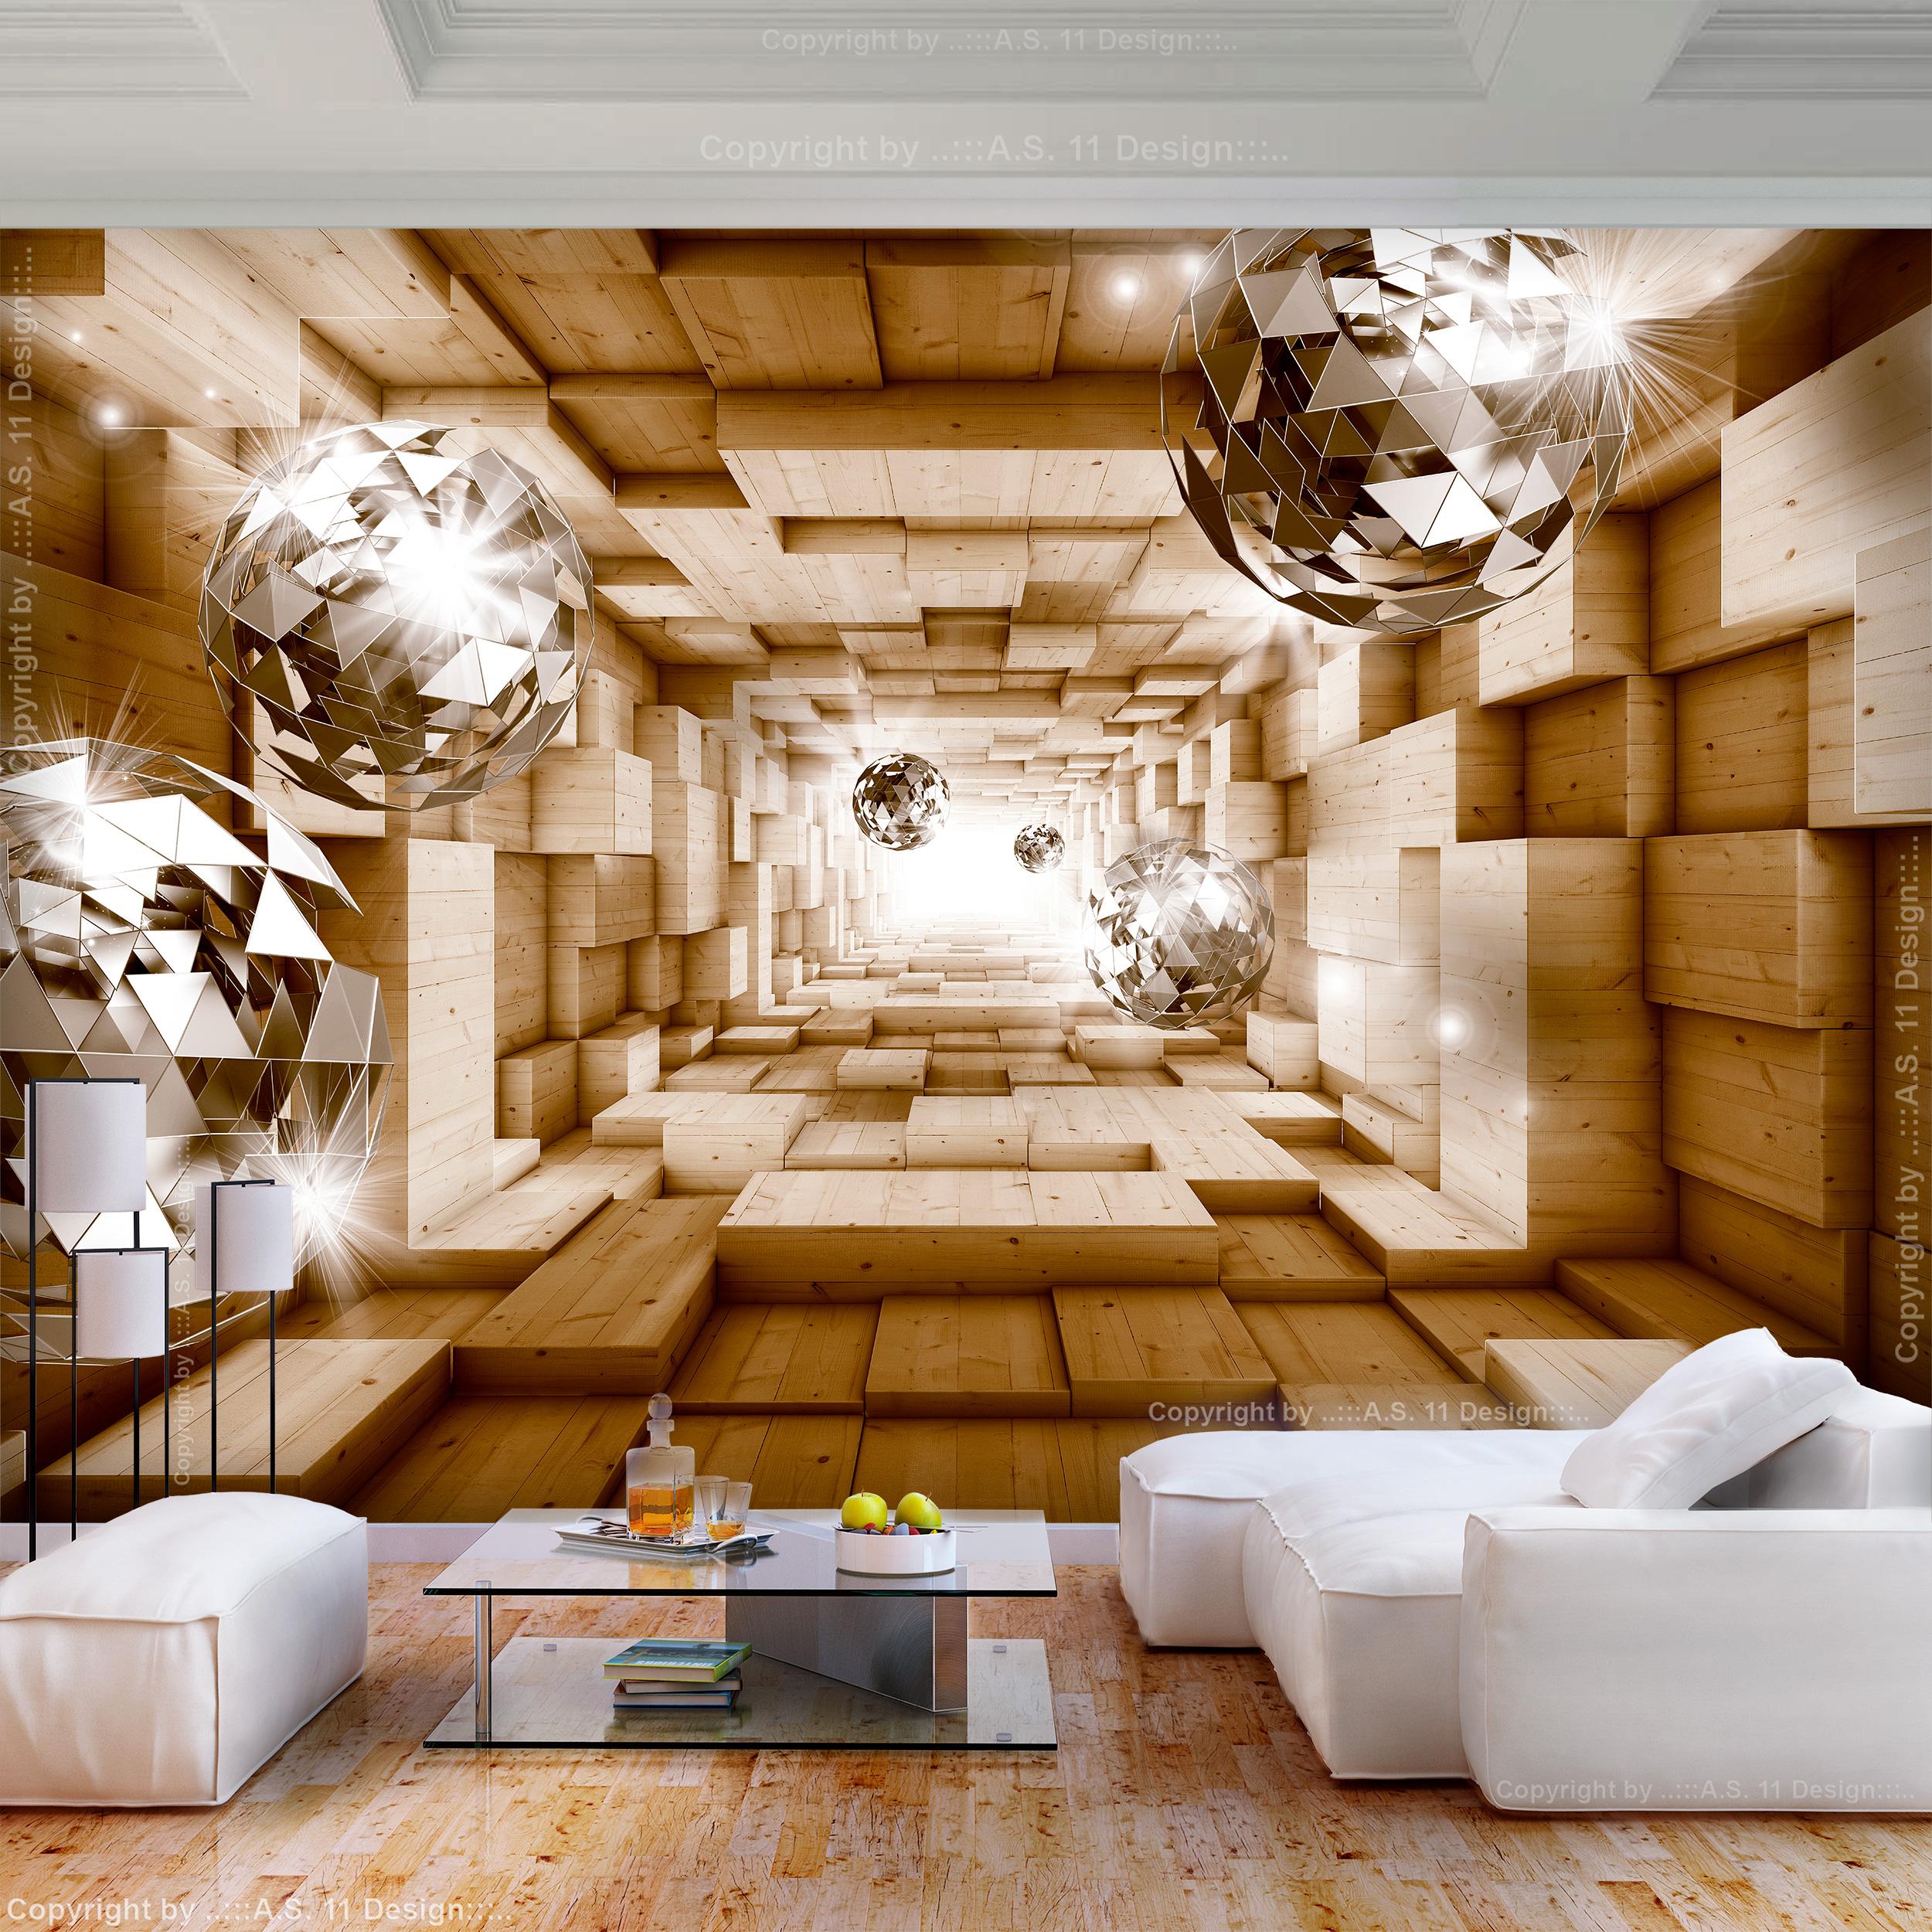 vlies fototapete 3d effekt kugeln diamant grau tunnel tapete wandbilder xxl 117 ebay. Black Bedroom Furniture Sets. Home Design Ideas